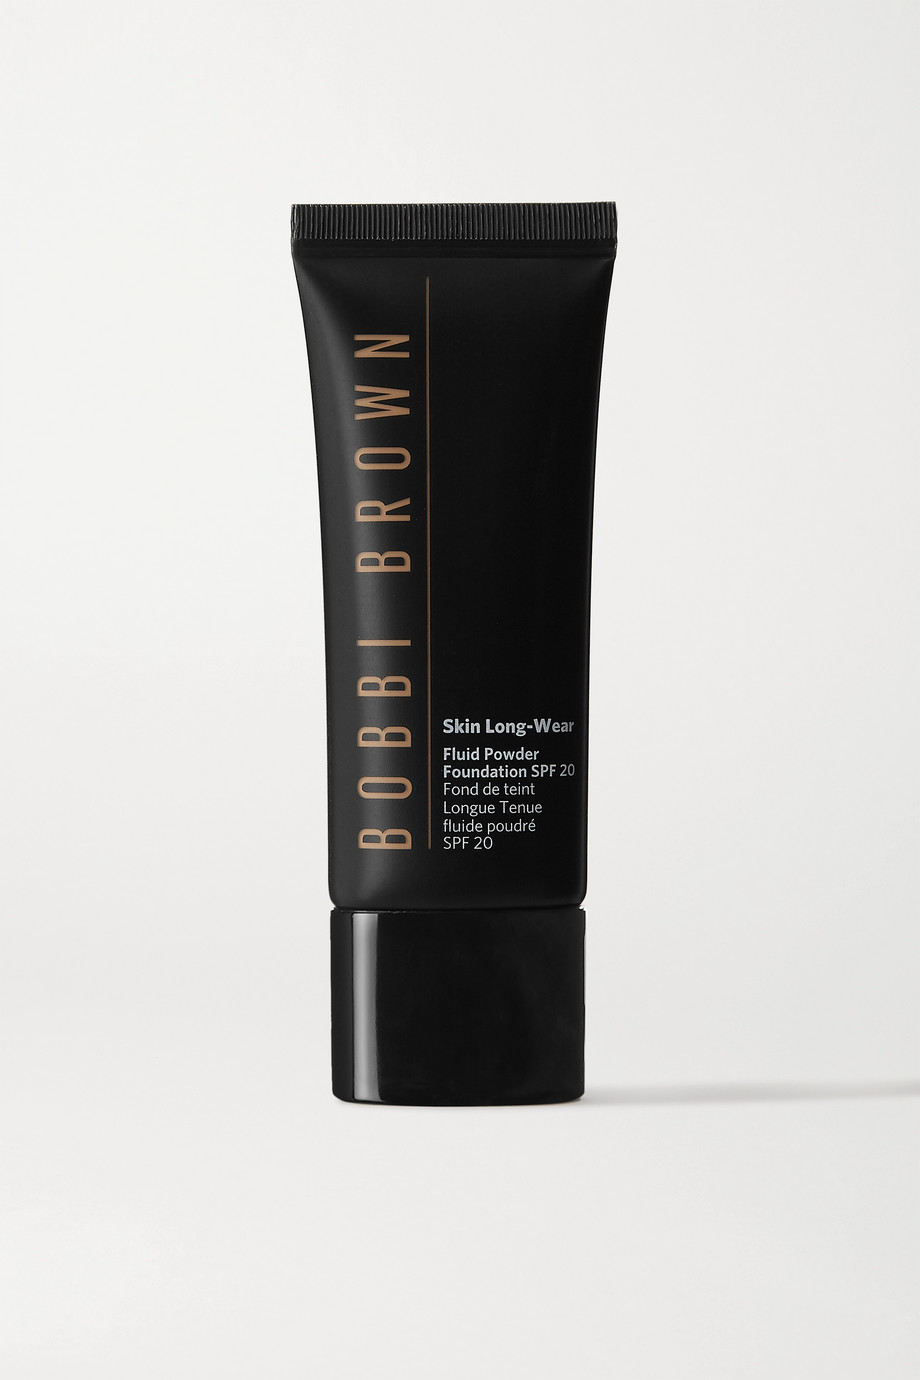 Bobbi Brown Skin Long-Wear Fluid Powder Foundation SPF20 - Natural